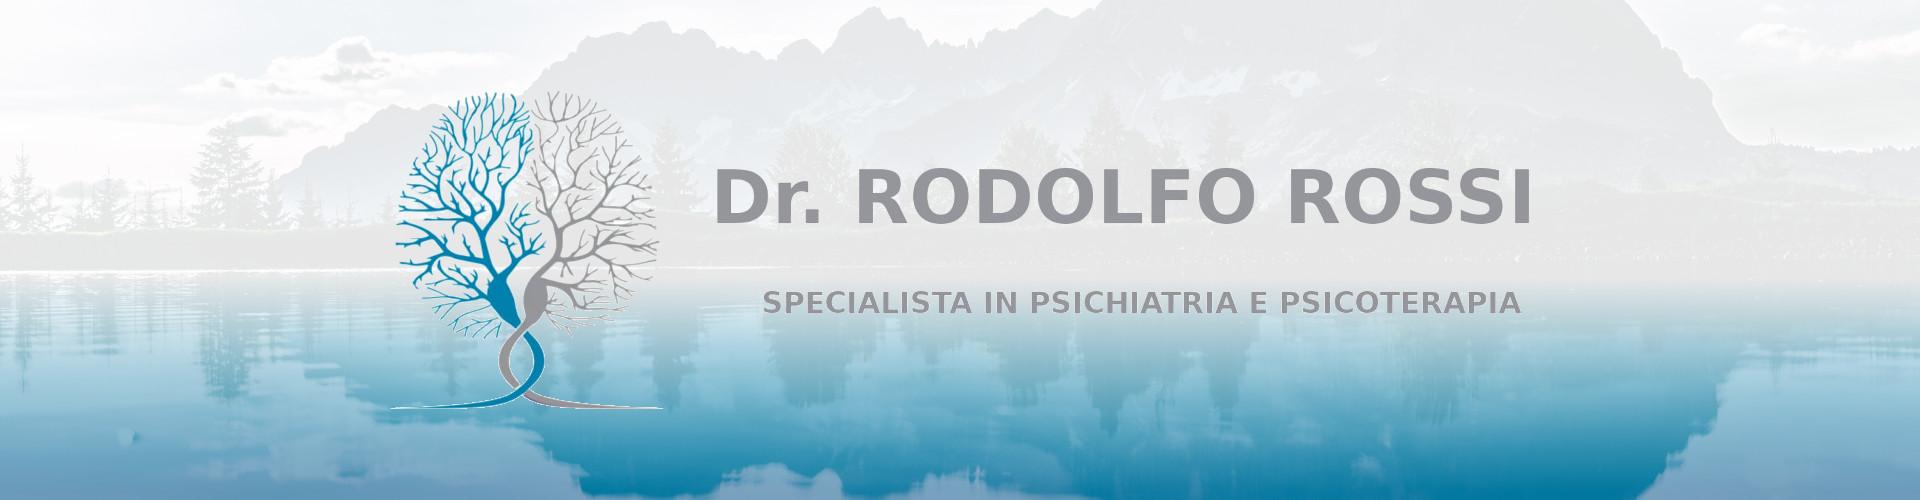 Dr. RODOLFO ROSSI